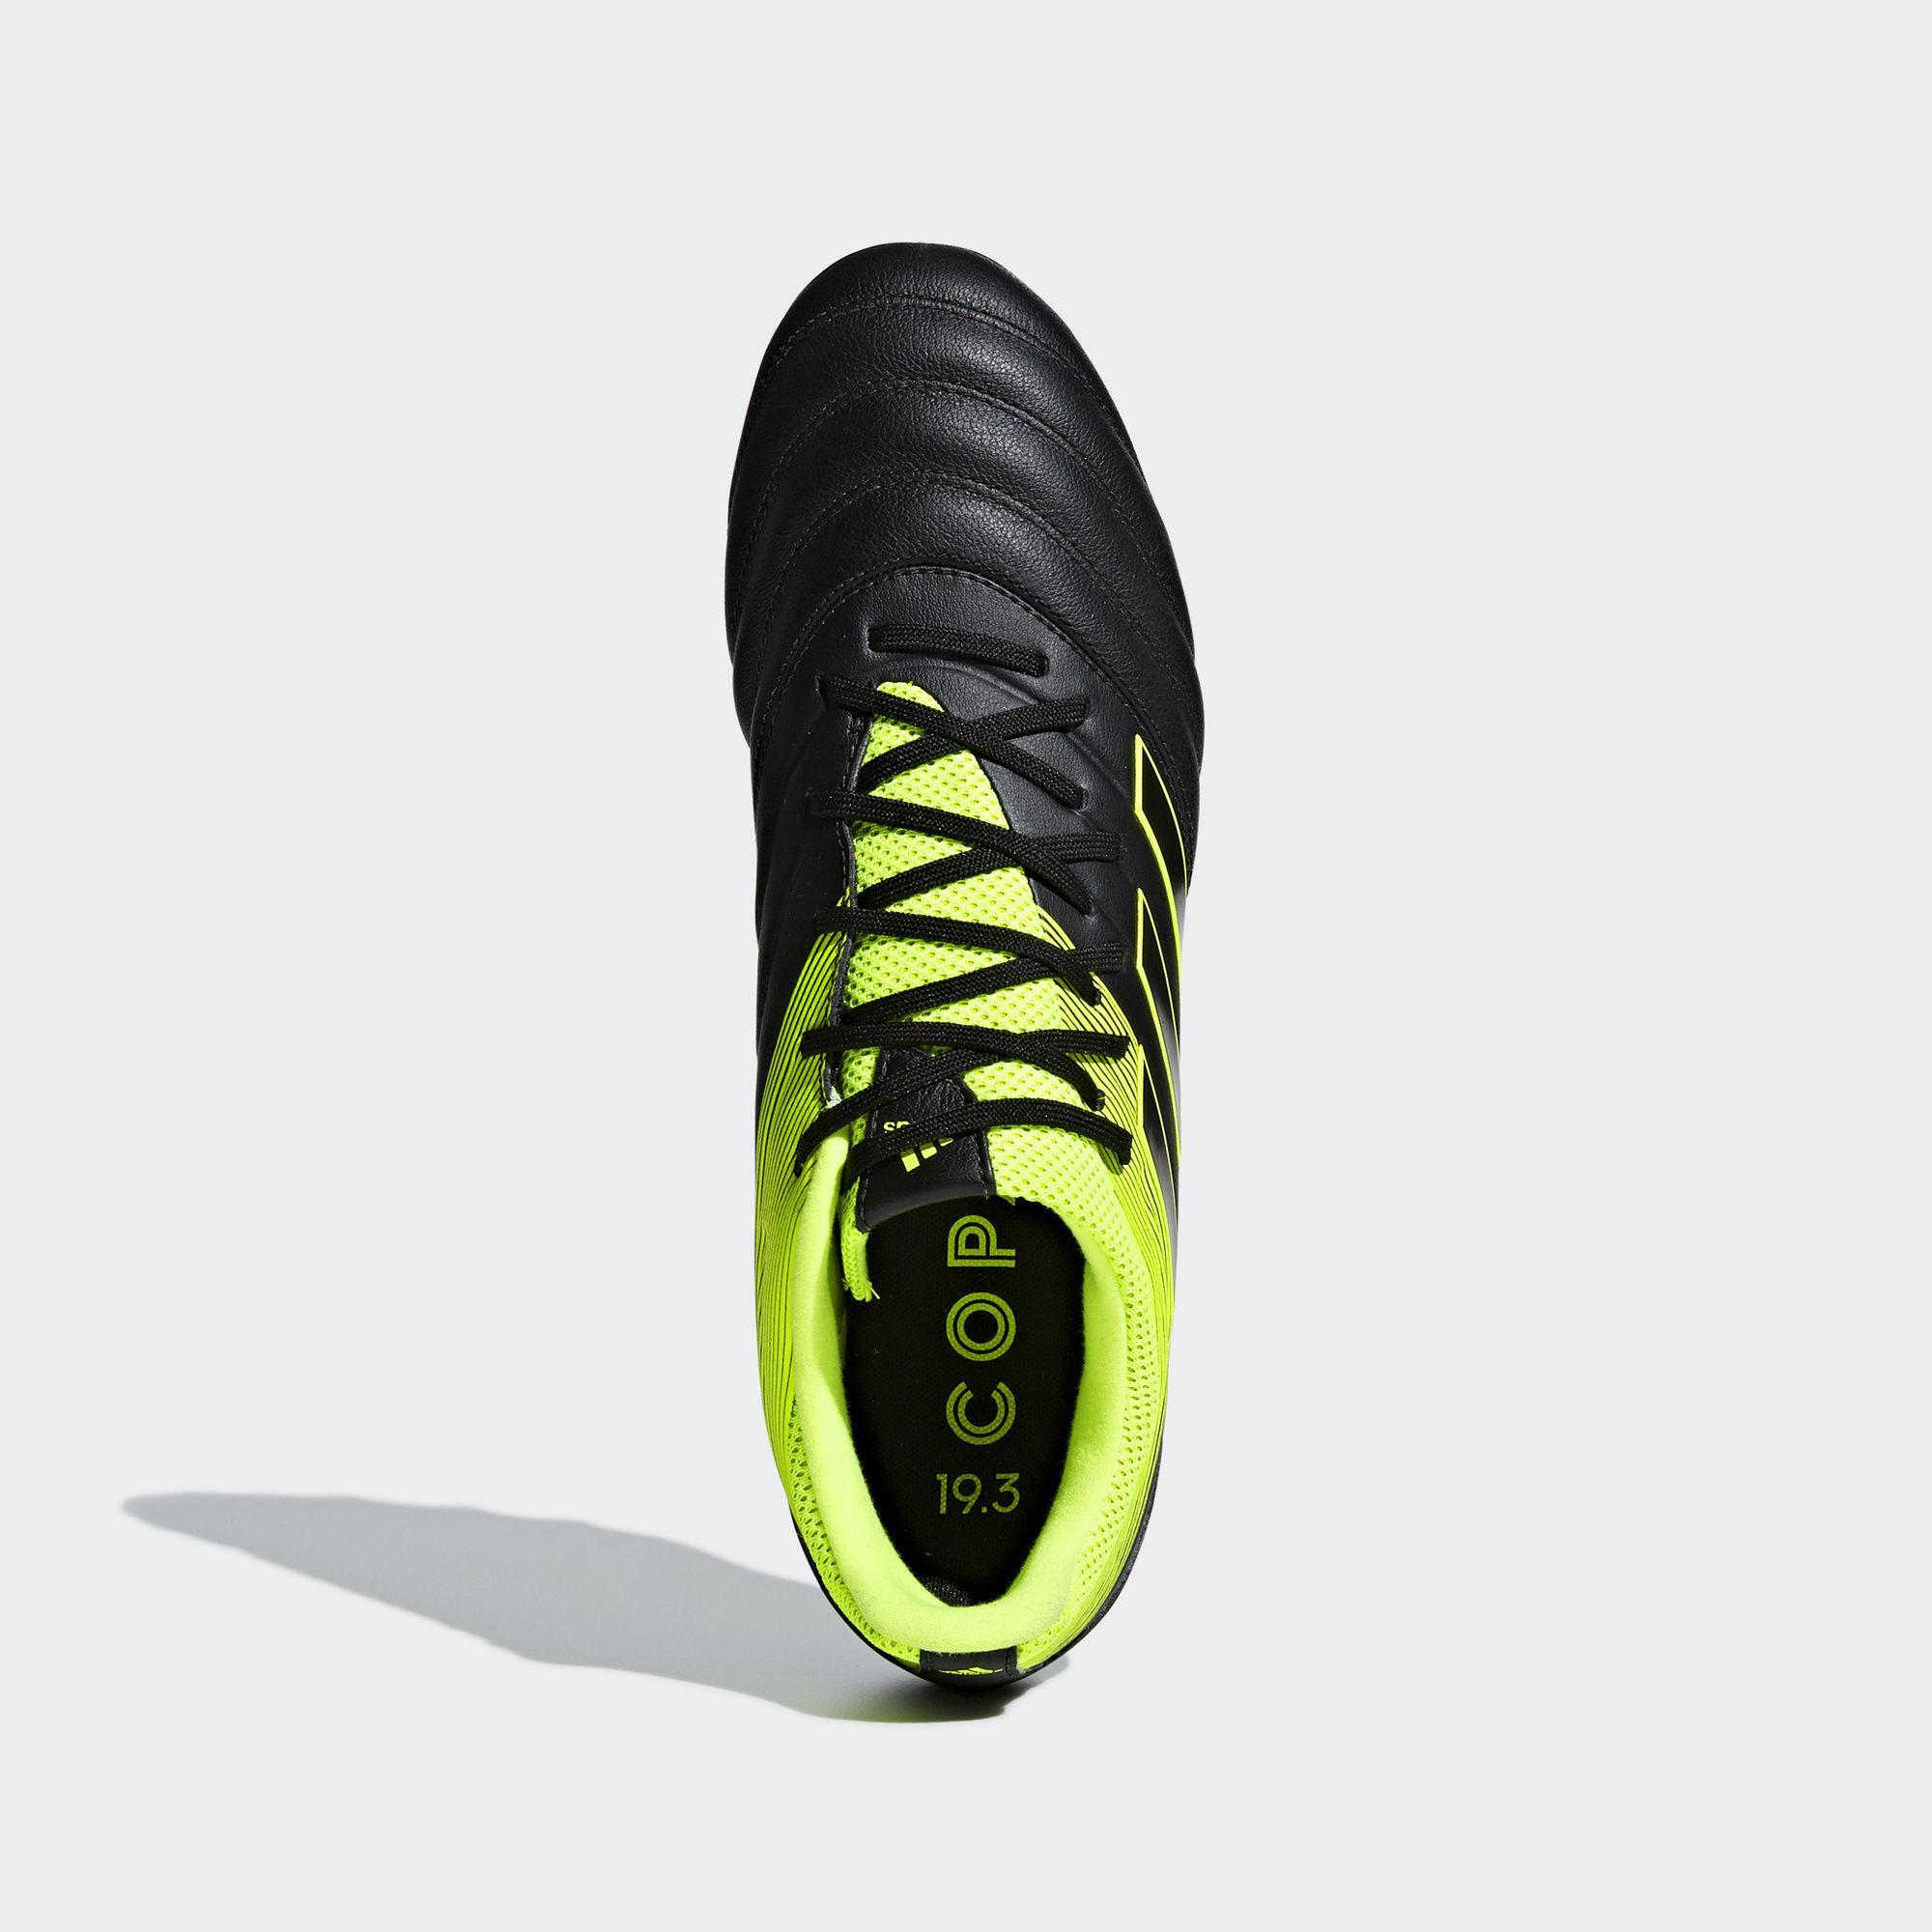 477c81f83 Adidas - Black Copa 19.3 Artificial Grass Boots for Men - Lyst. View  fullscreen